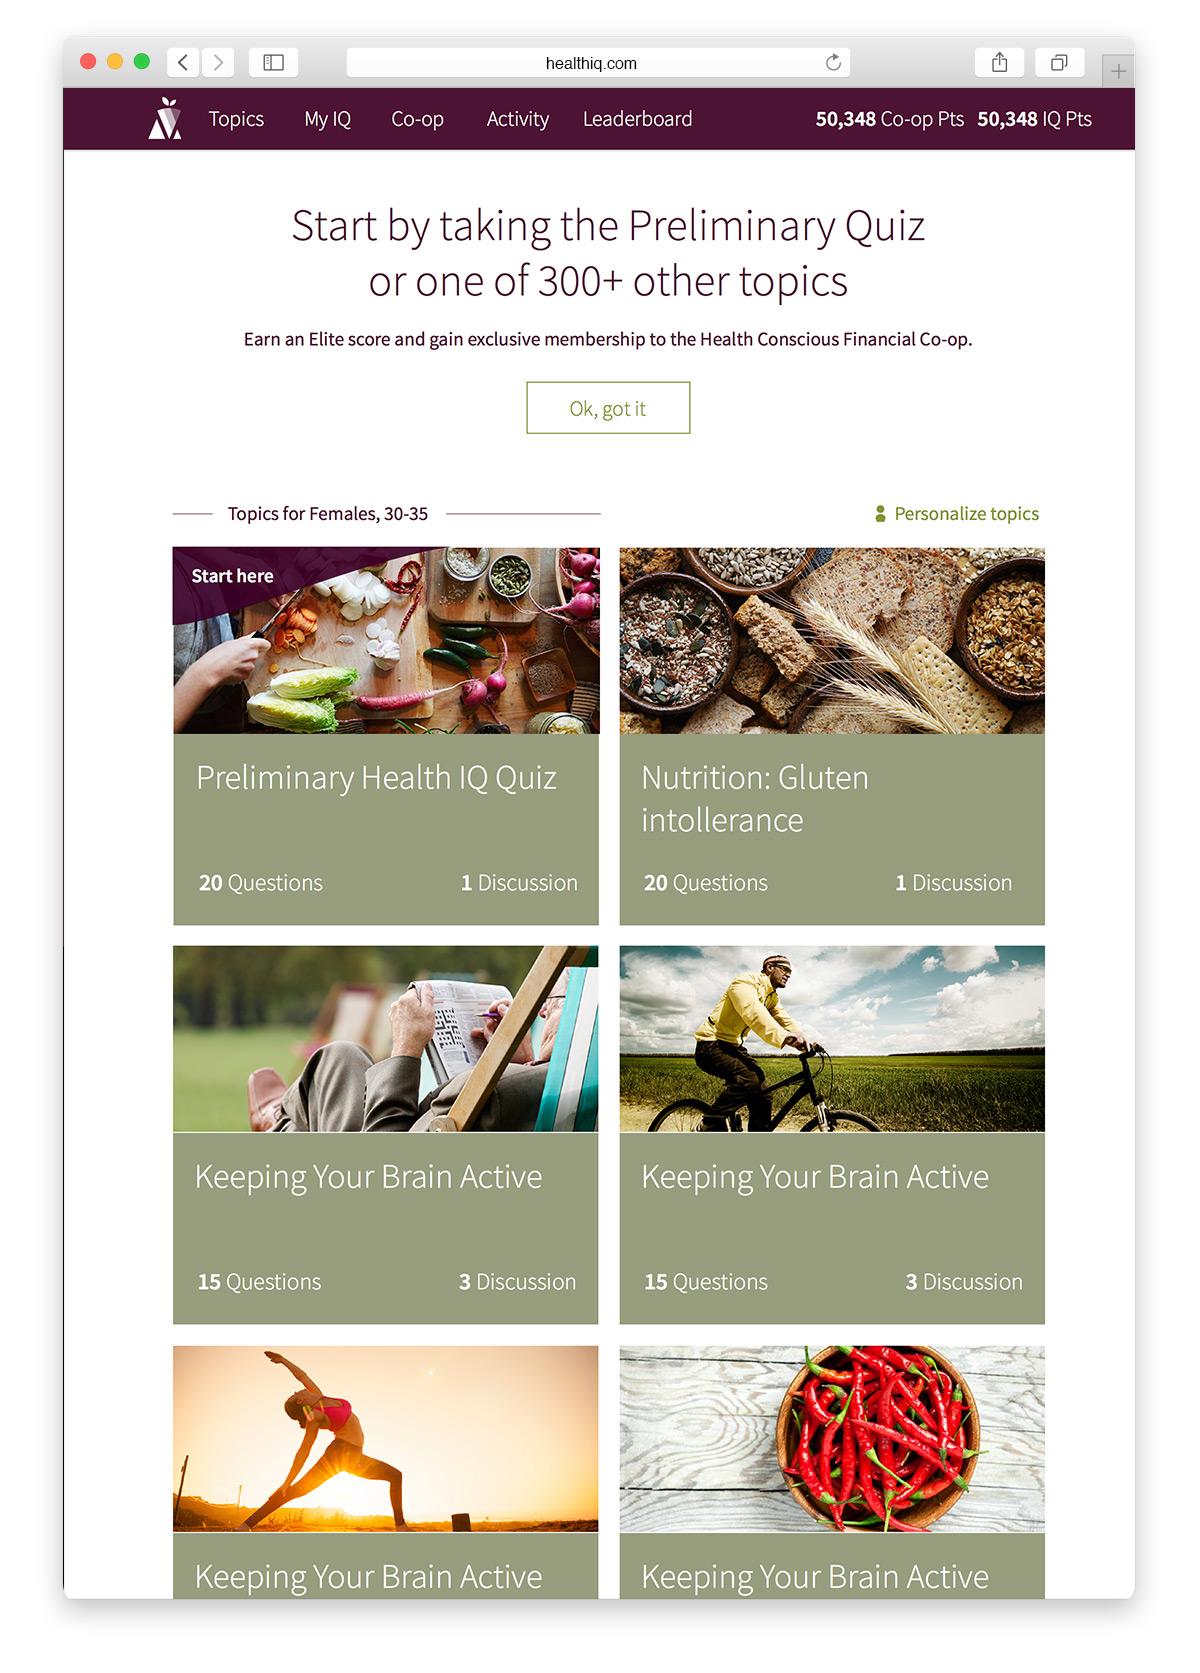 hiq-web-app-06.jpg